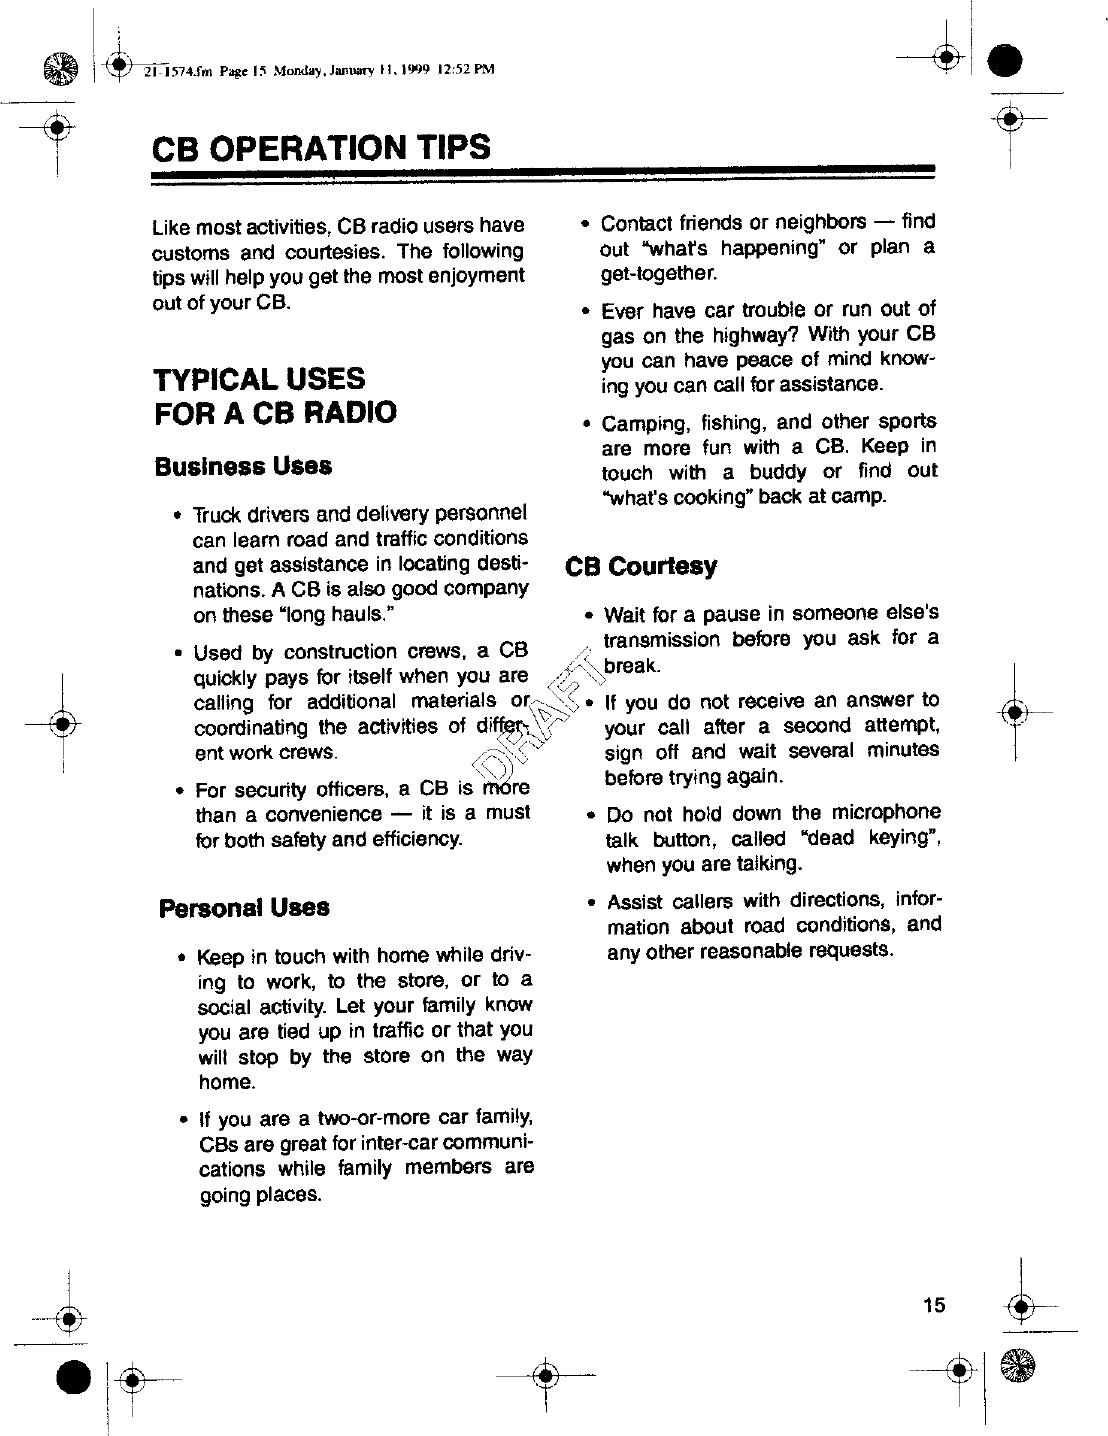 Radio Shack 2101574 User Manual 30720